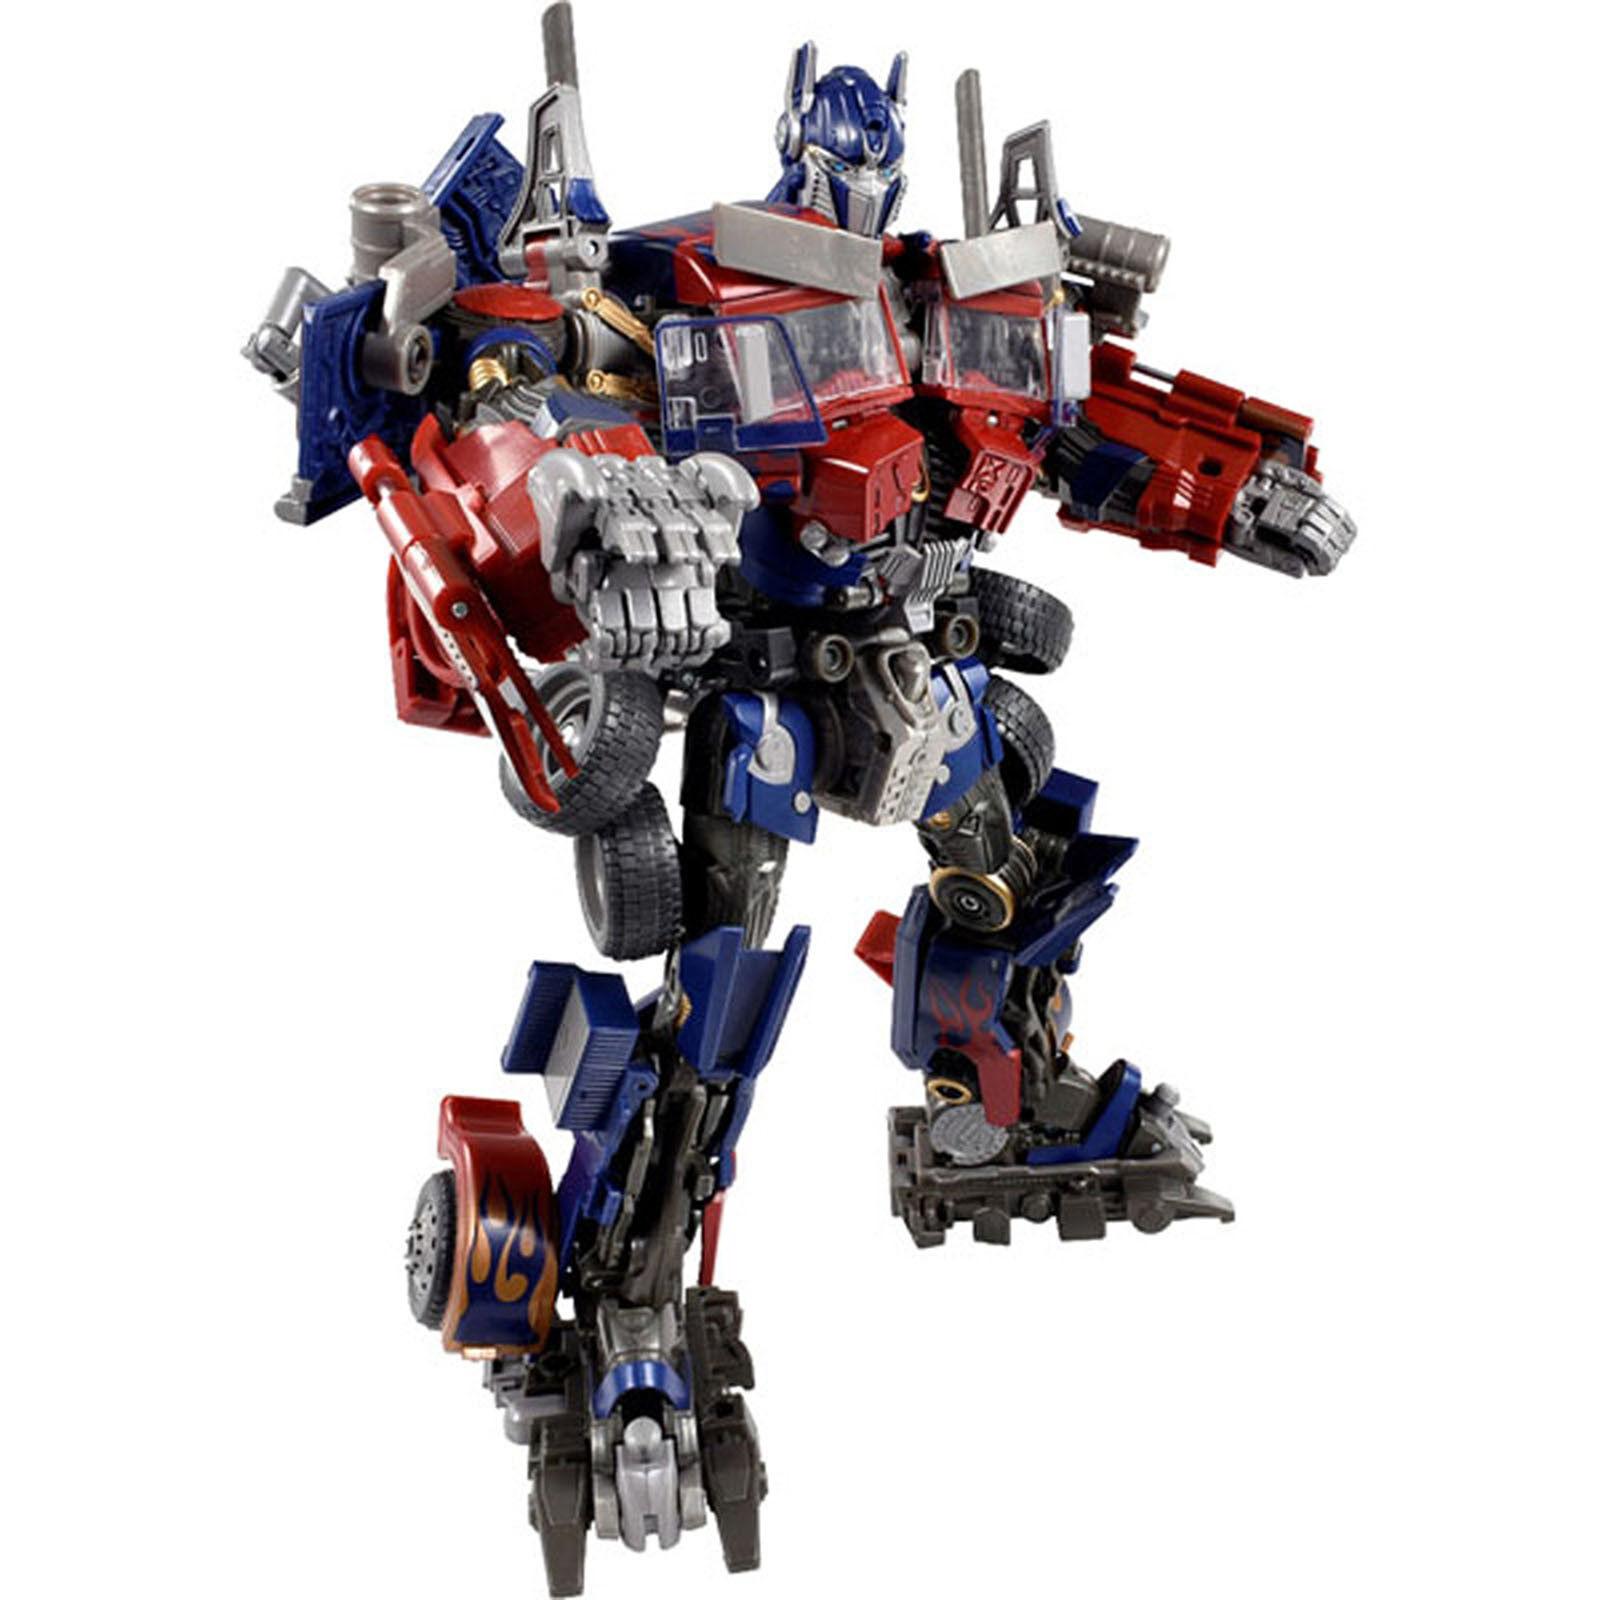 Hot   Transformers Movie the Best MB-17 Optimus Prime REVENGE VERSION Robots